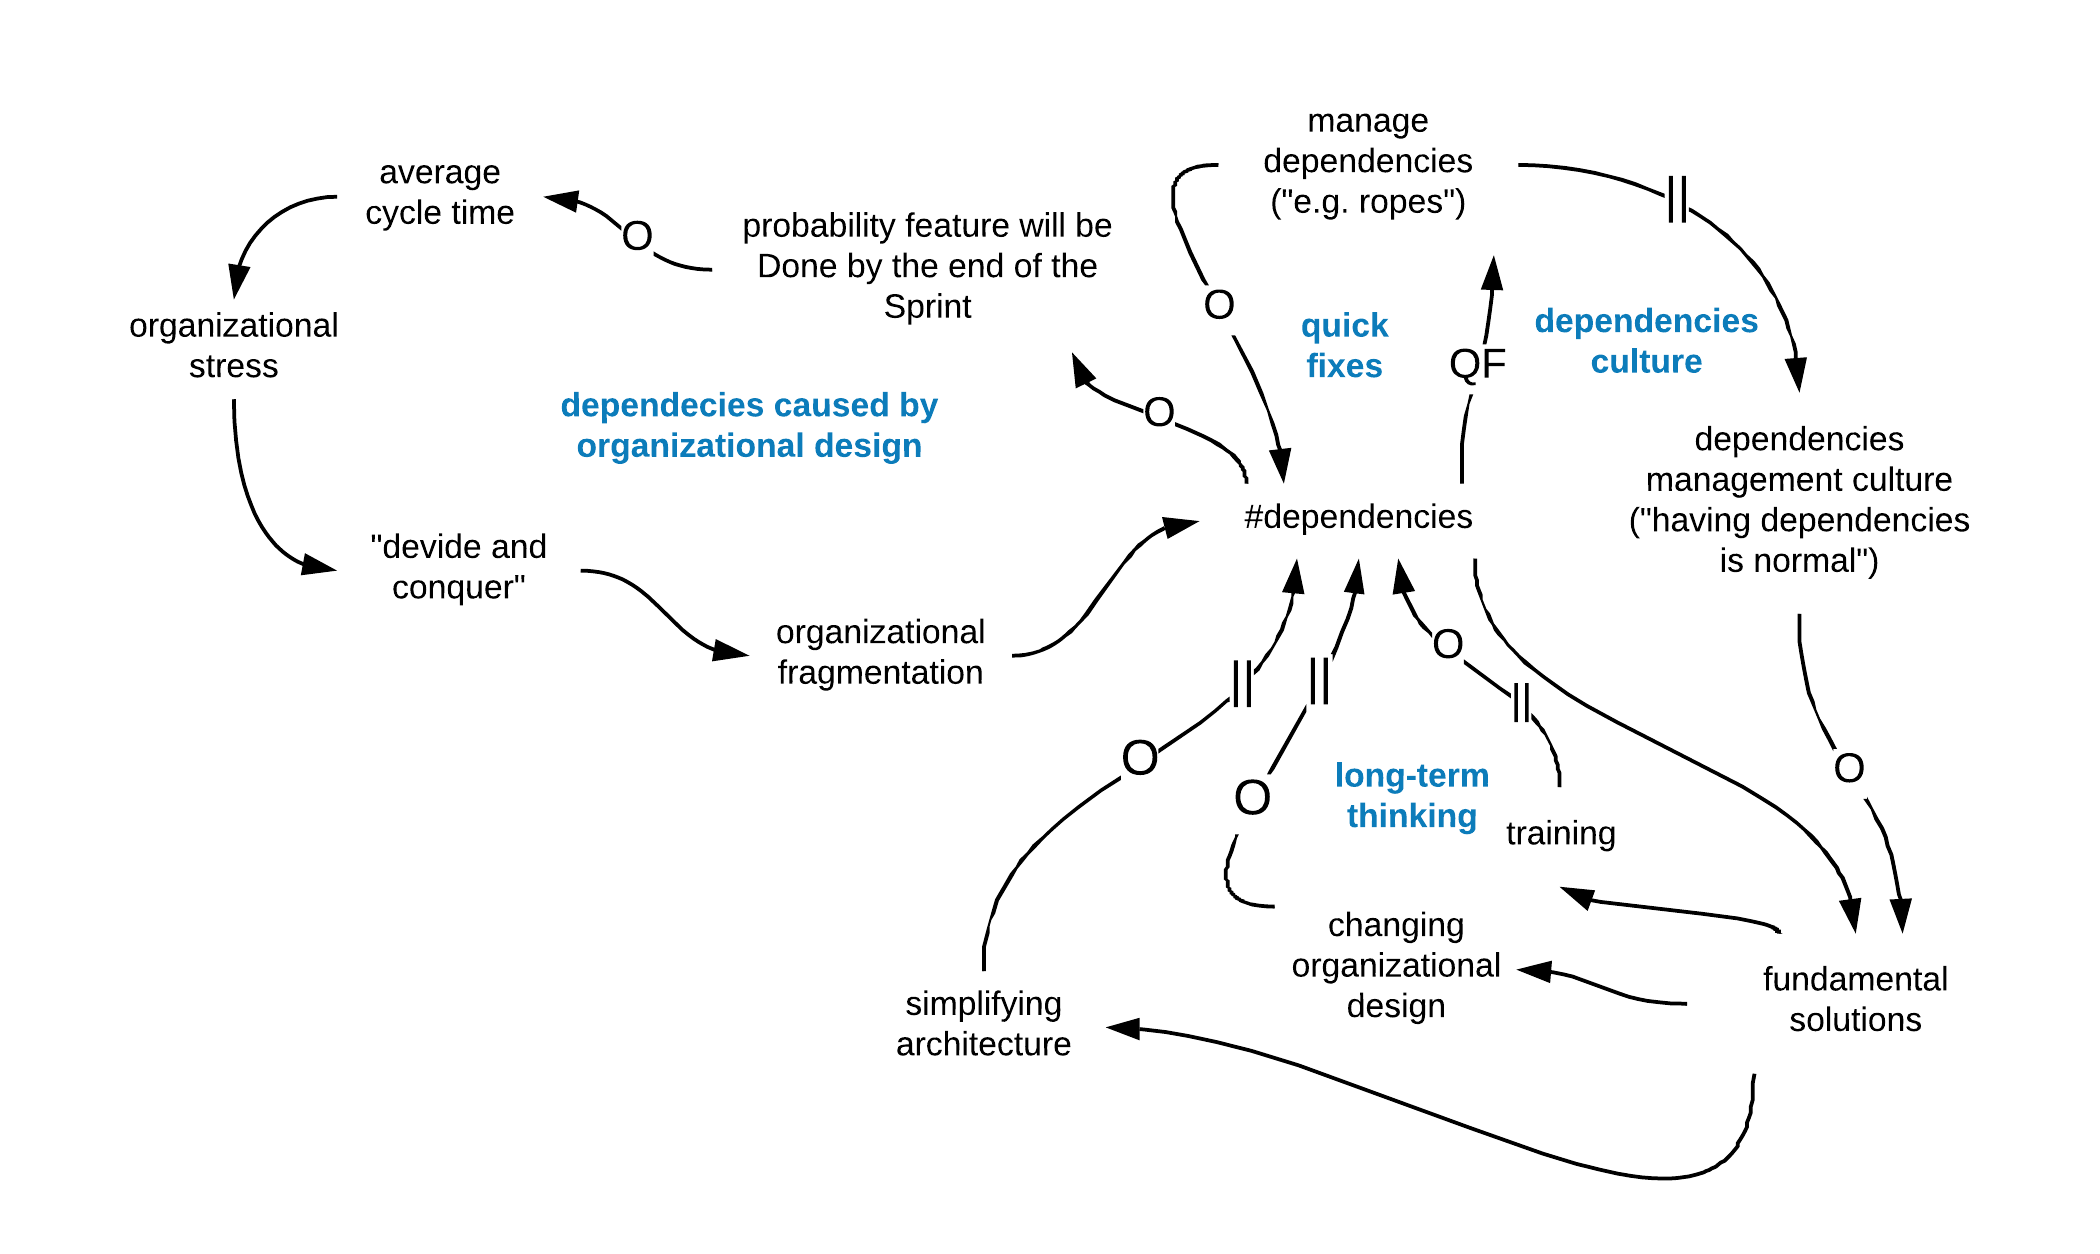 System Model for Managing Dependencies